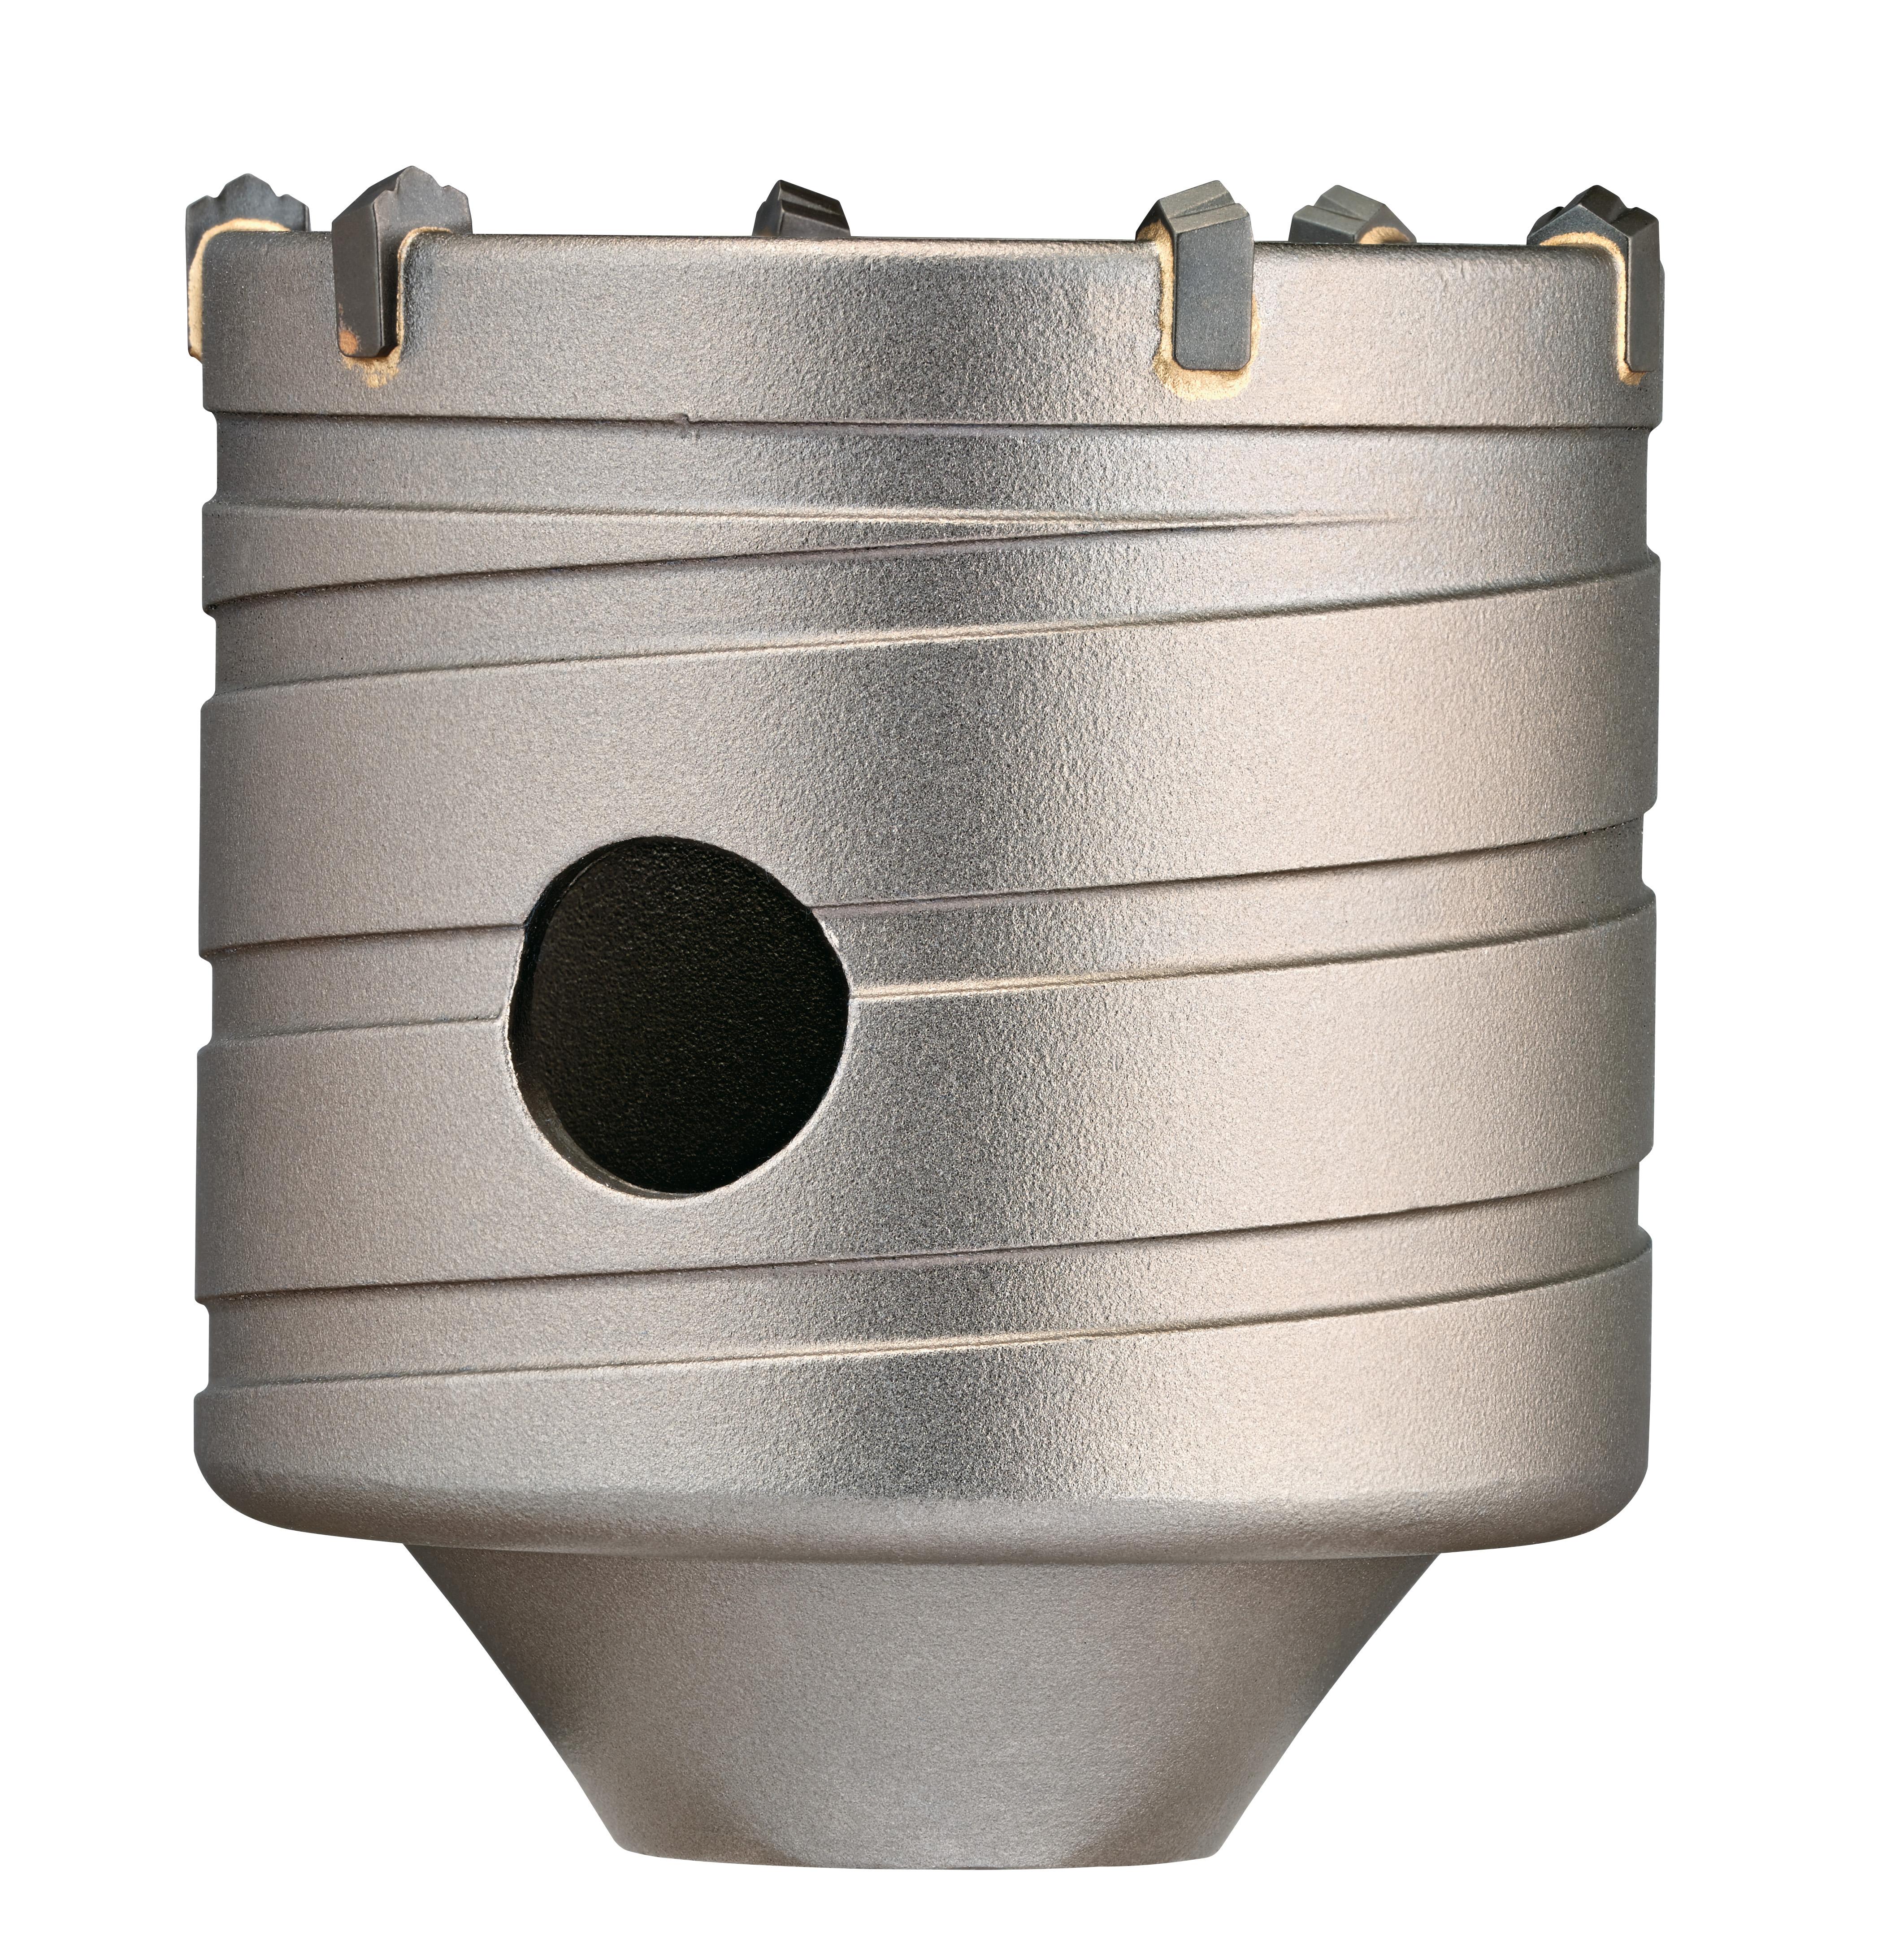 Milwaukee® 48-20-5230 Core Bit, 2-9/16 in, Steel